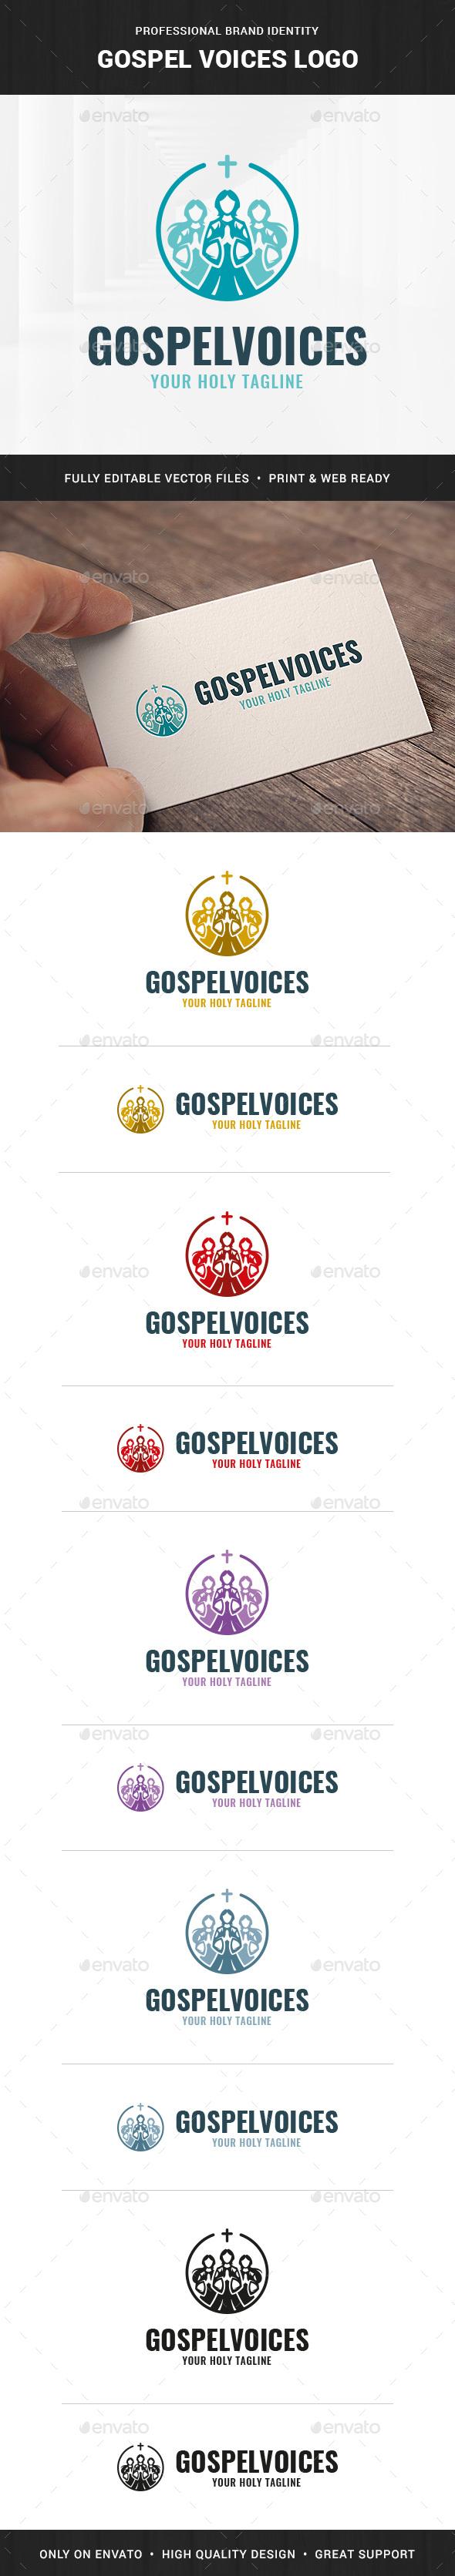 Gospel Voices Logo Template